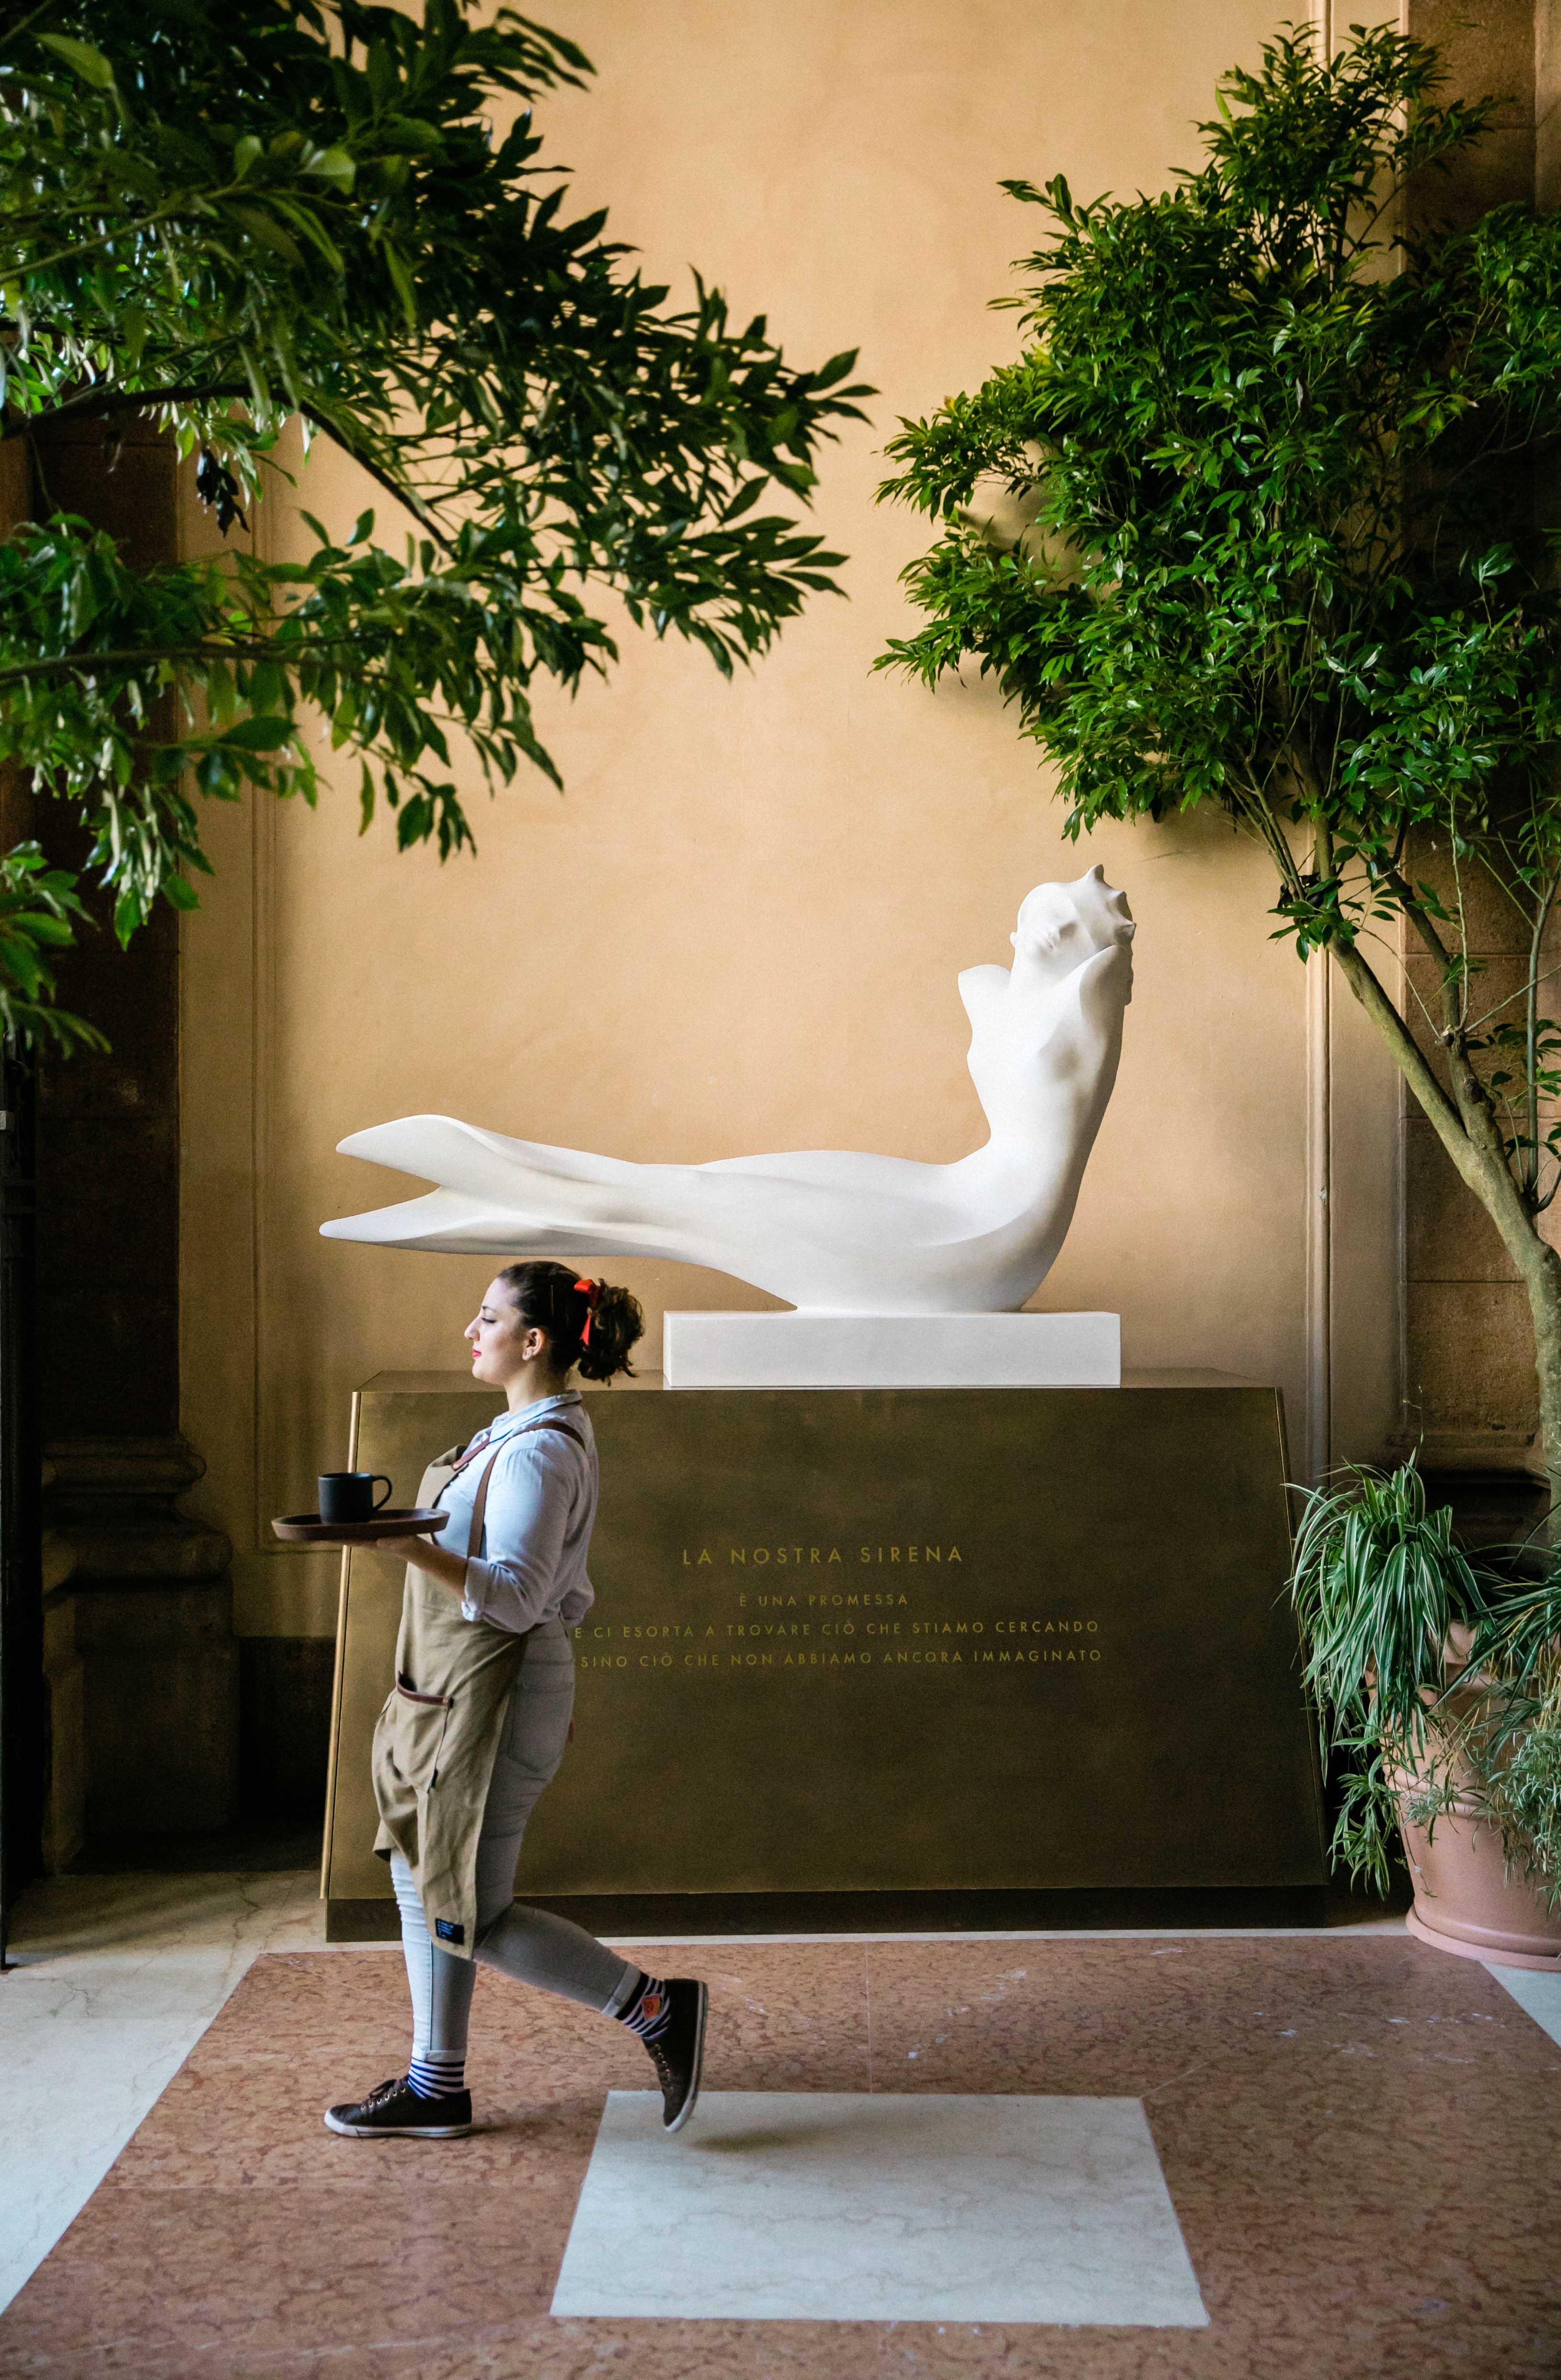 A partners walks past a sculpture of the Starbucks siren at the Starbucks Reserve Roastery in Milan, Italy on Tuesday, September 4, 2018. (Joshua Trujillo, Starbucks)